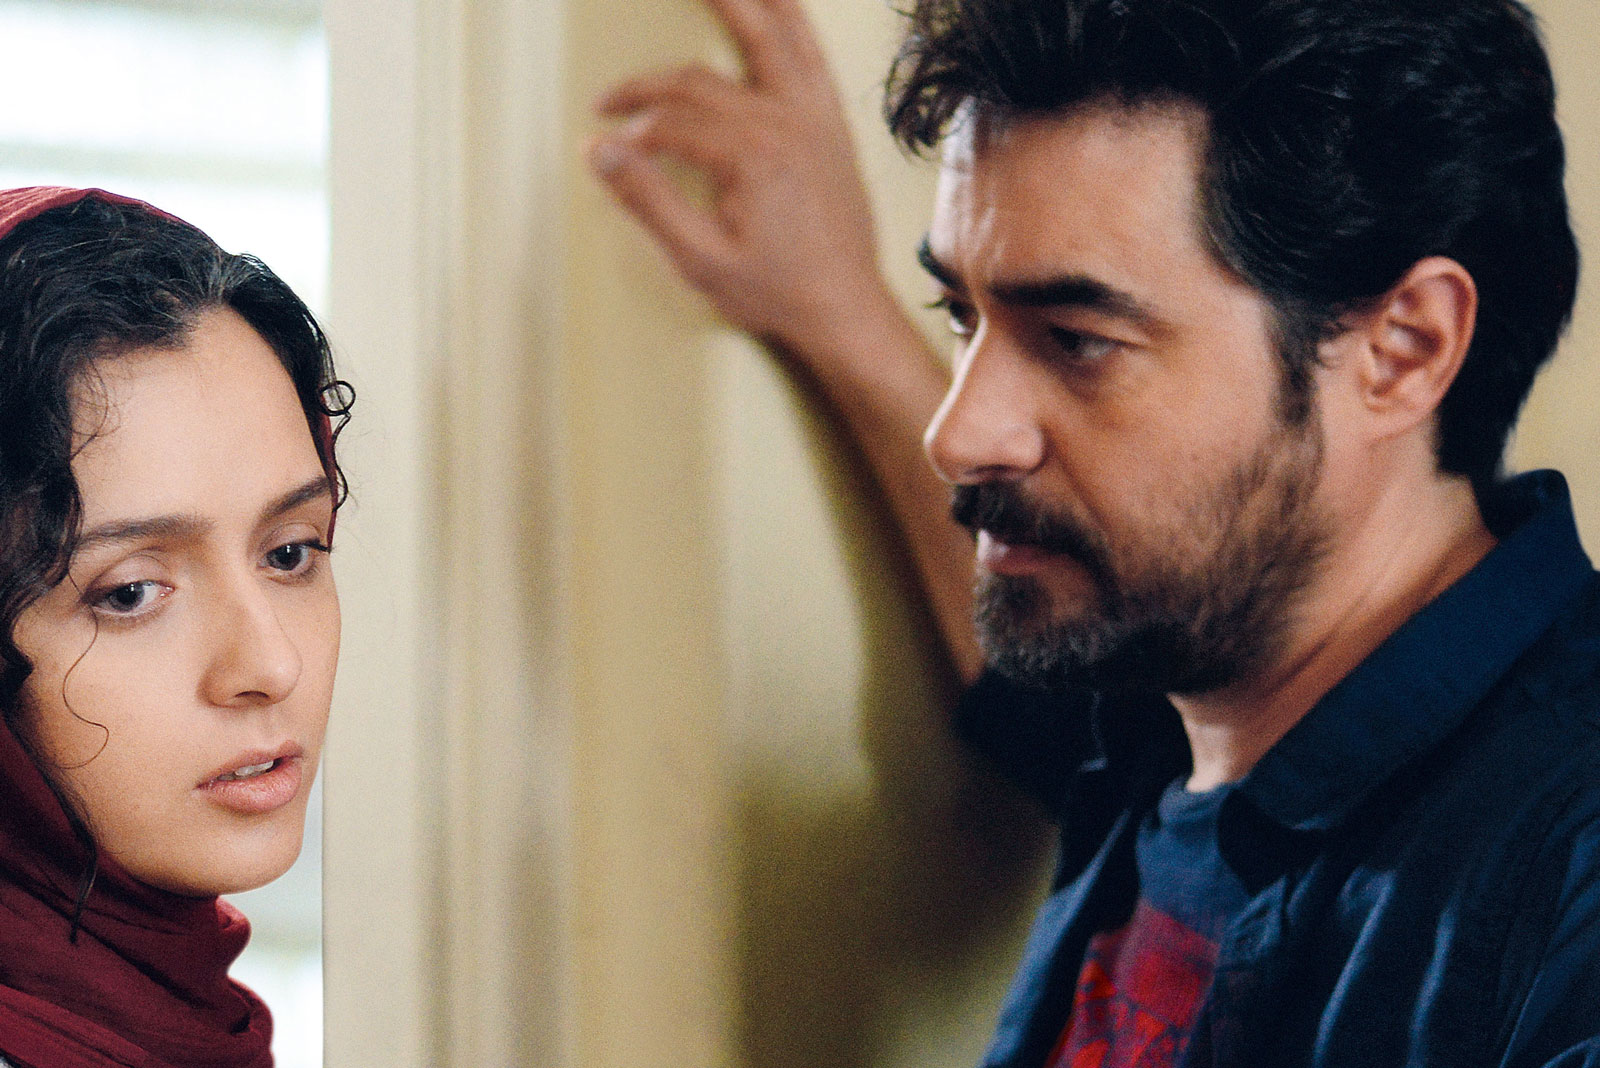 Taraneh Alidoosti as Rana and Shahab Hosseini as Emad in The Salesman, 2016